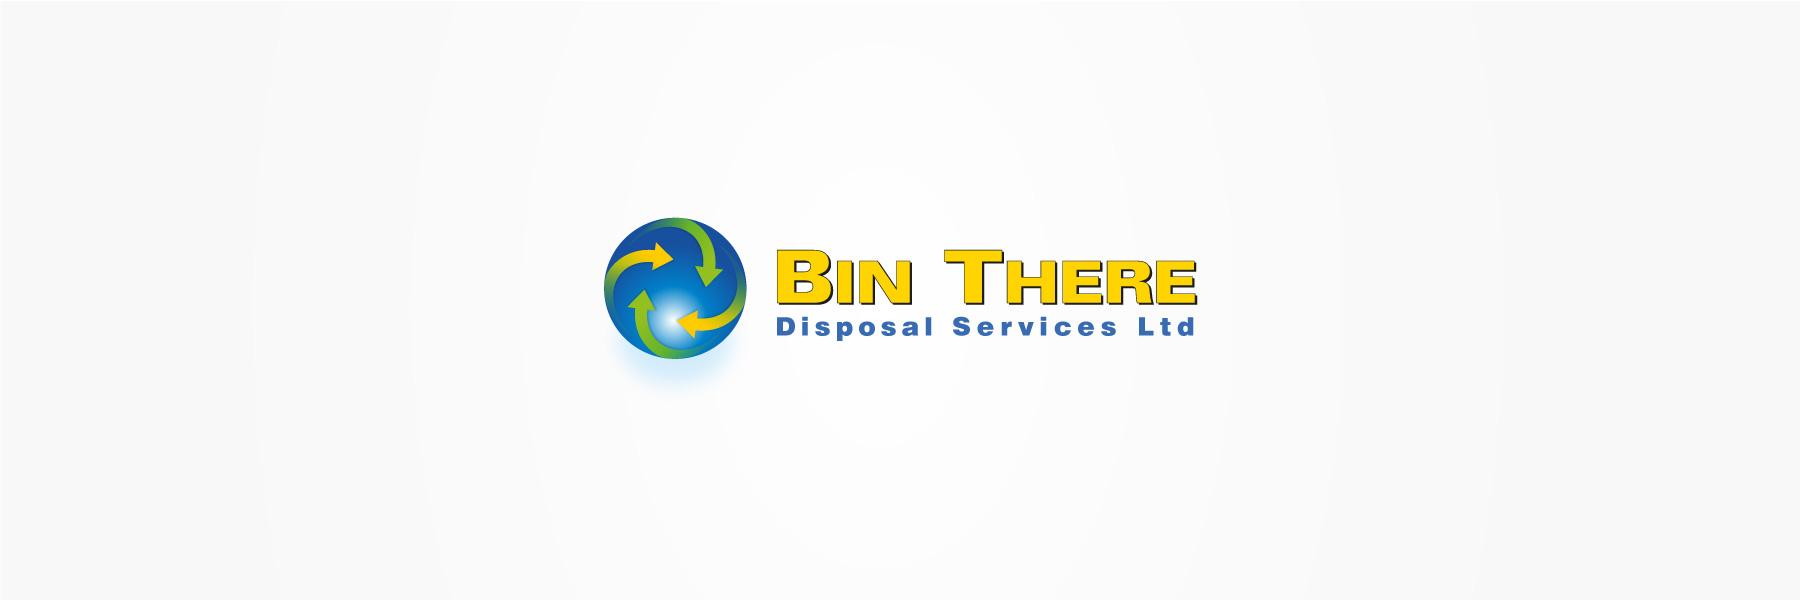 Bin-There-Logo-Design